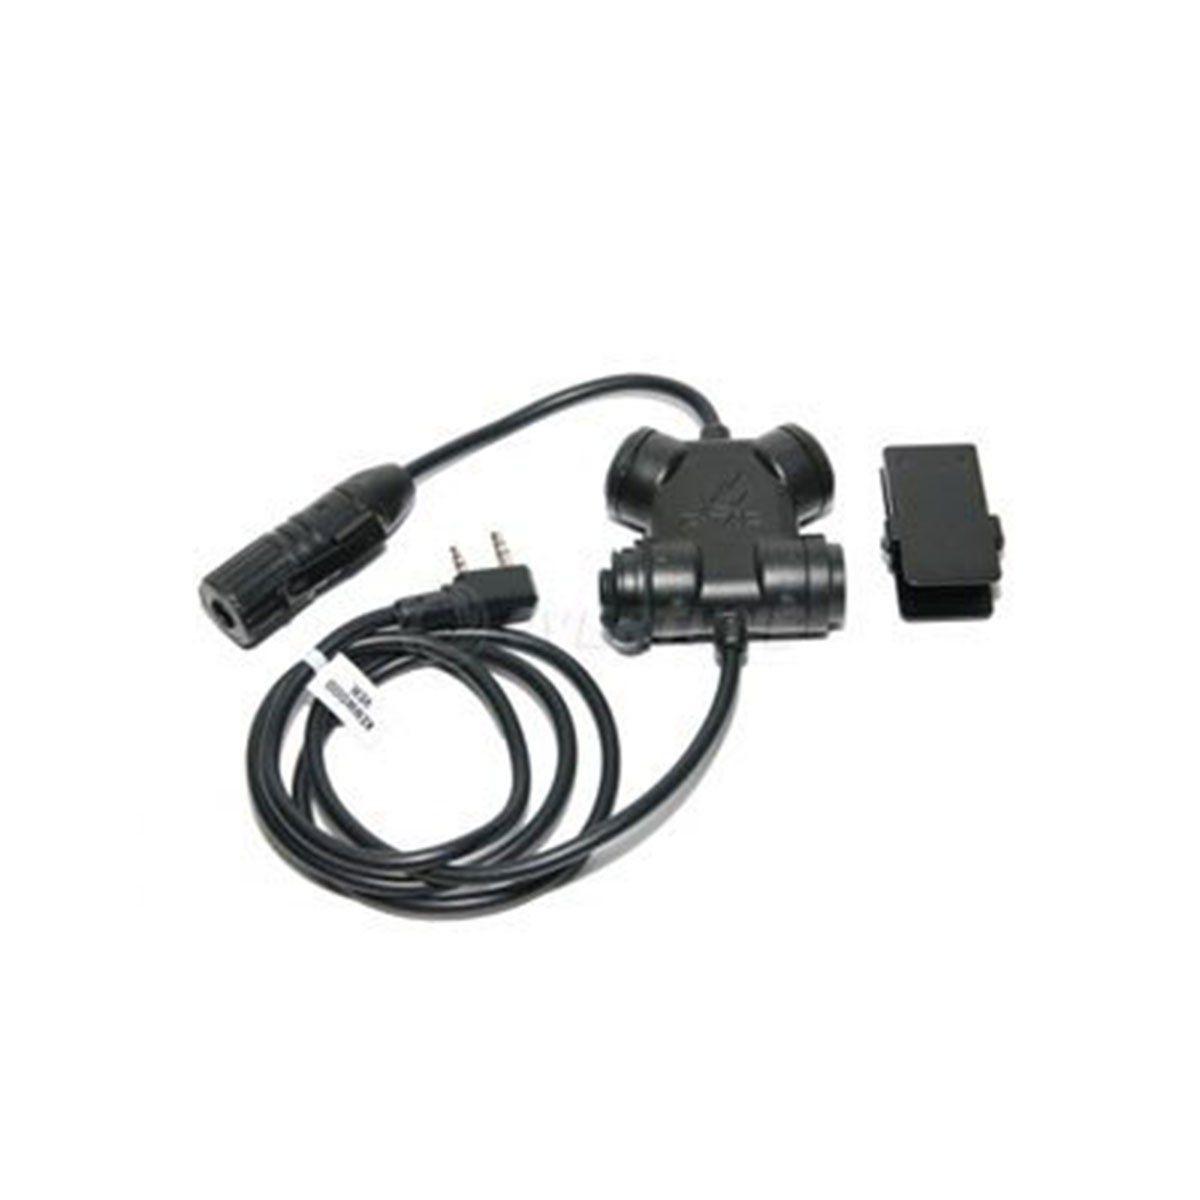 Chave Interruptor Para Microfone/radio Comunicador Baofeng Z130ken Zsil Ynx Clarus Ptt